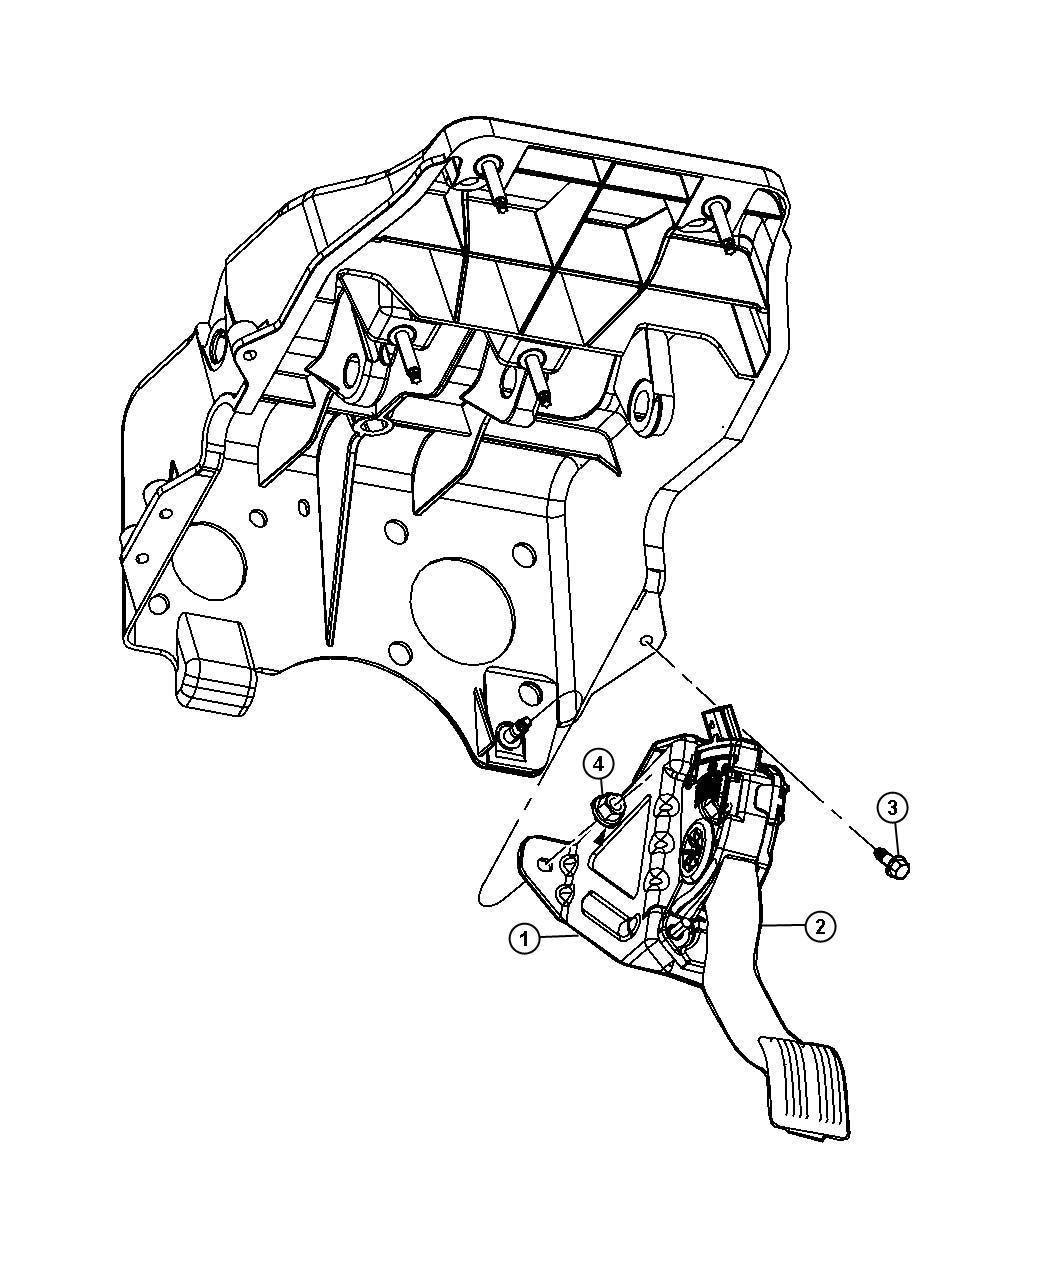 Dodge Ram Pedal Accelerator Apps